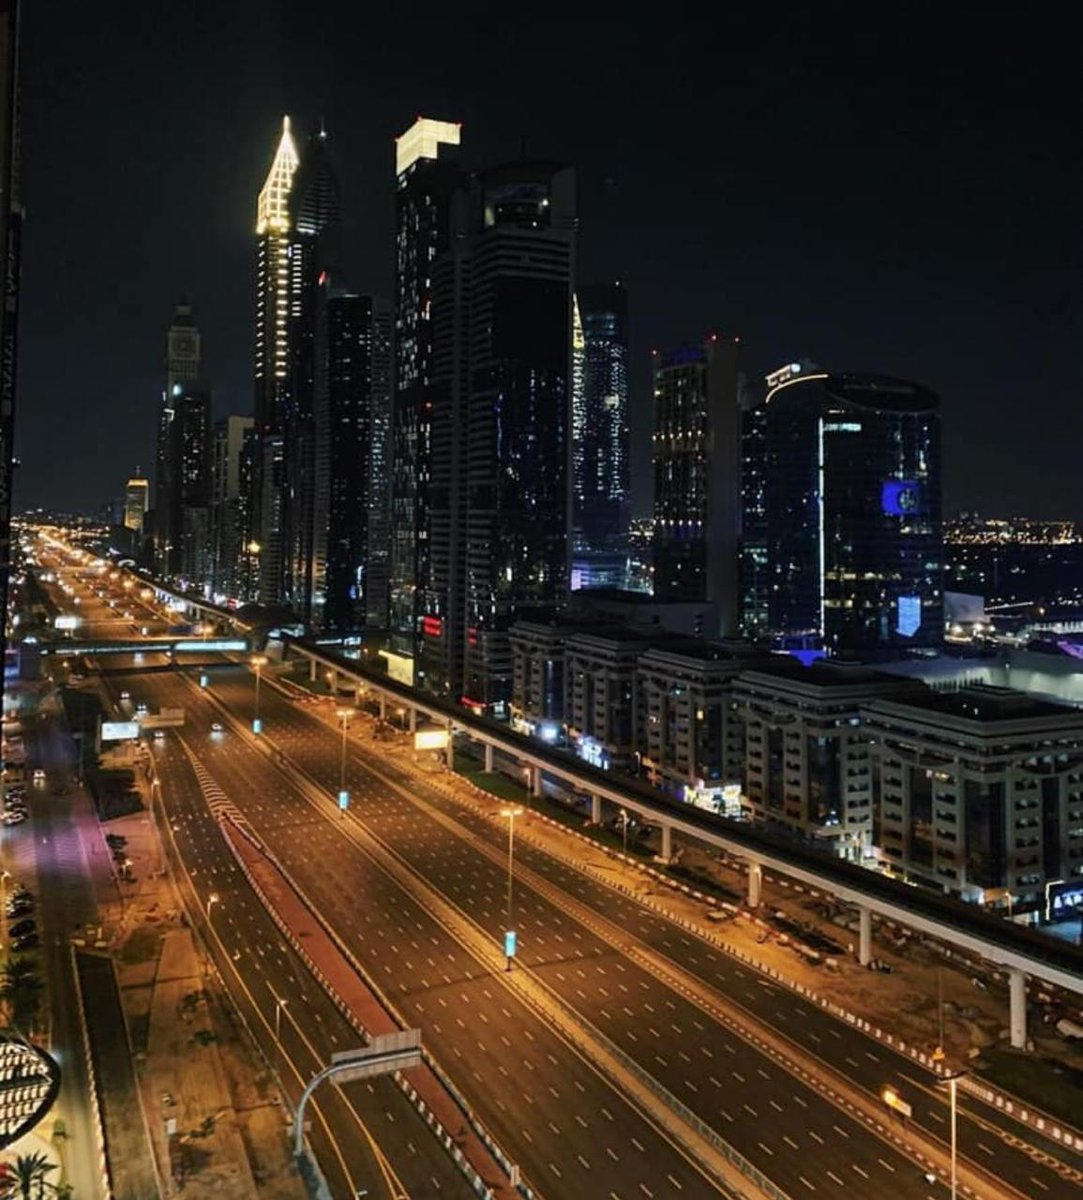 #lockdown21 lock down #Dubai last night picture pic.twitter.com/honaDDI5y9